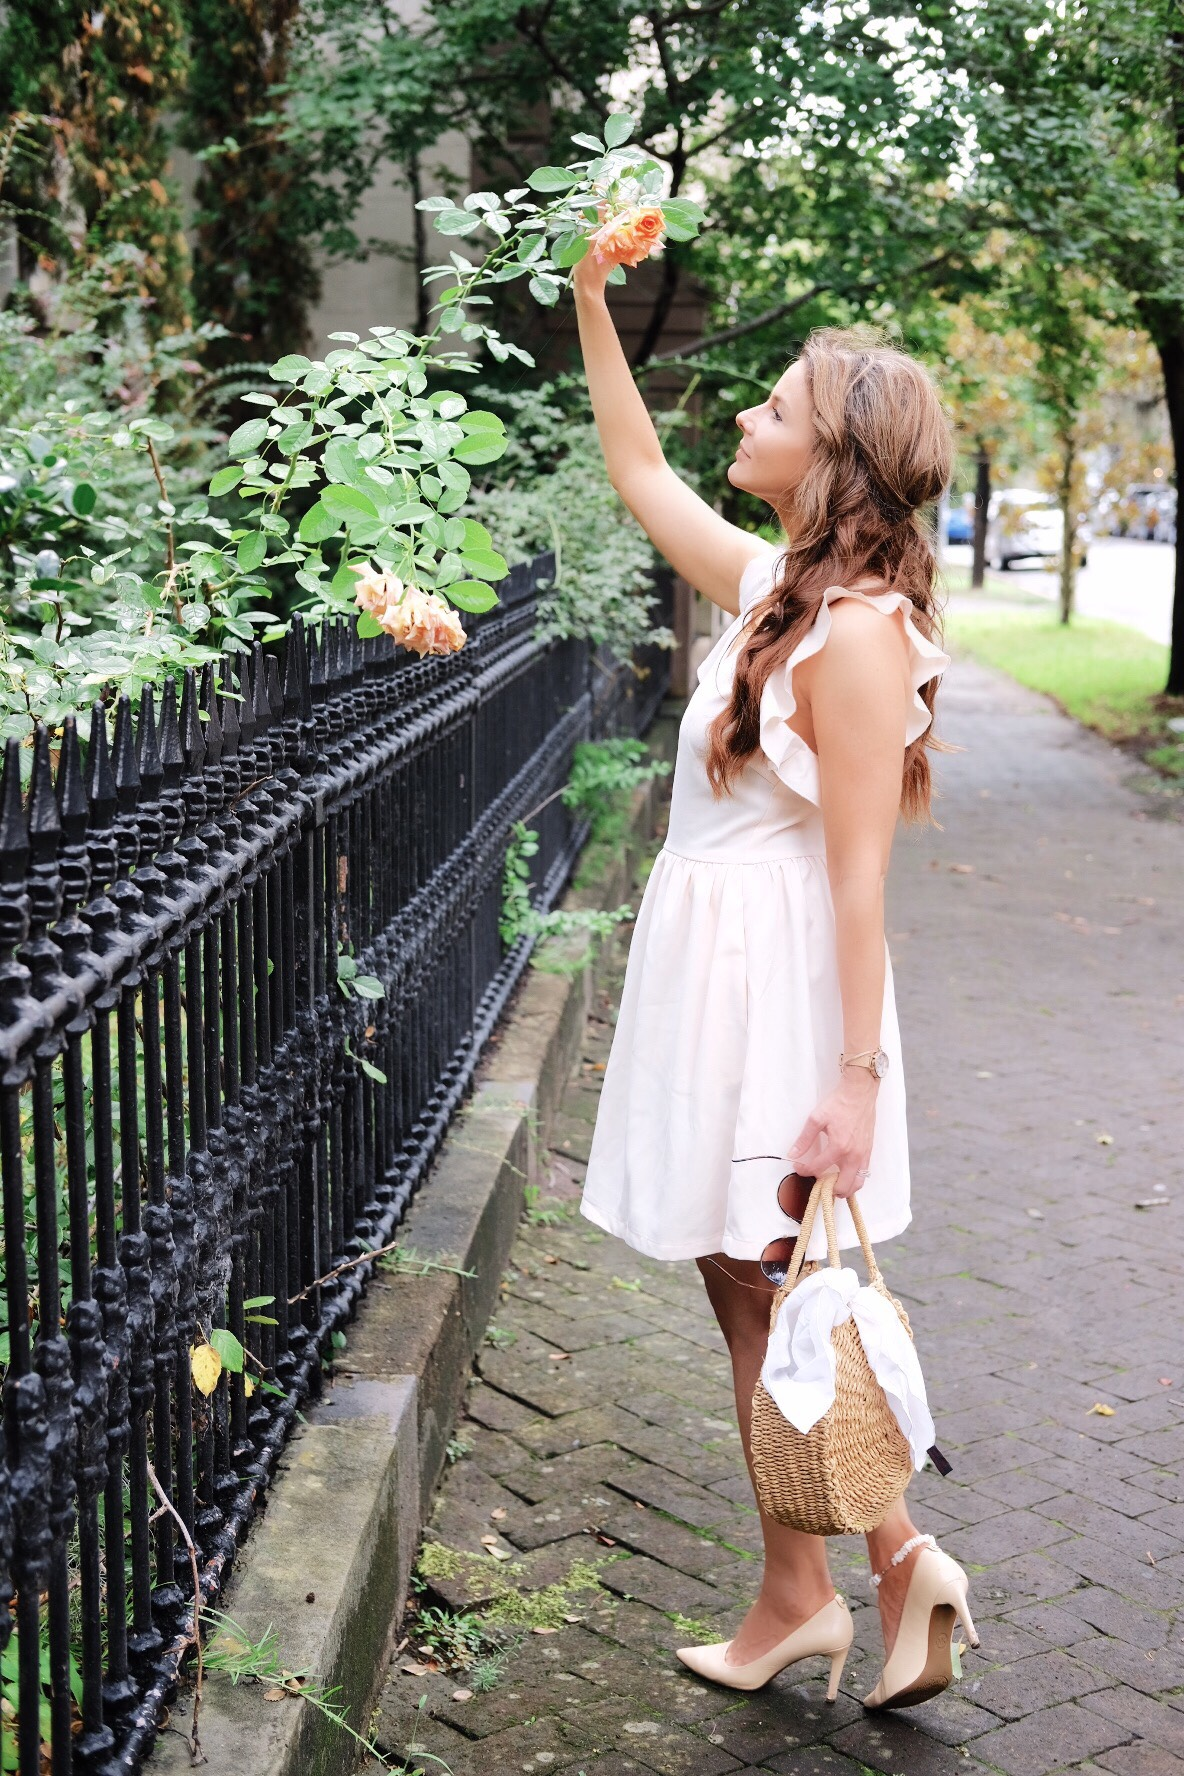 Brenna Lauren Michaels standing on cobbled street by rosebush, wearing blush pink frilly dress.